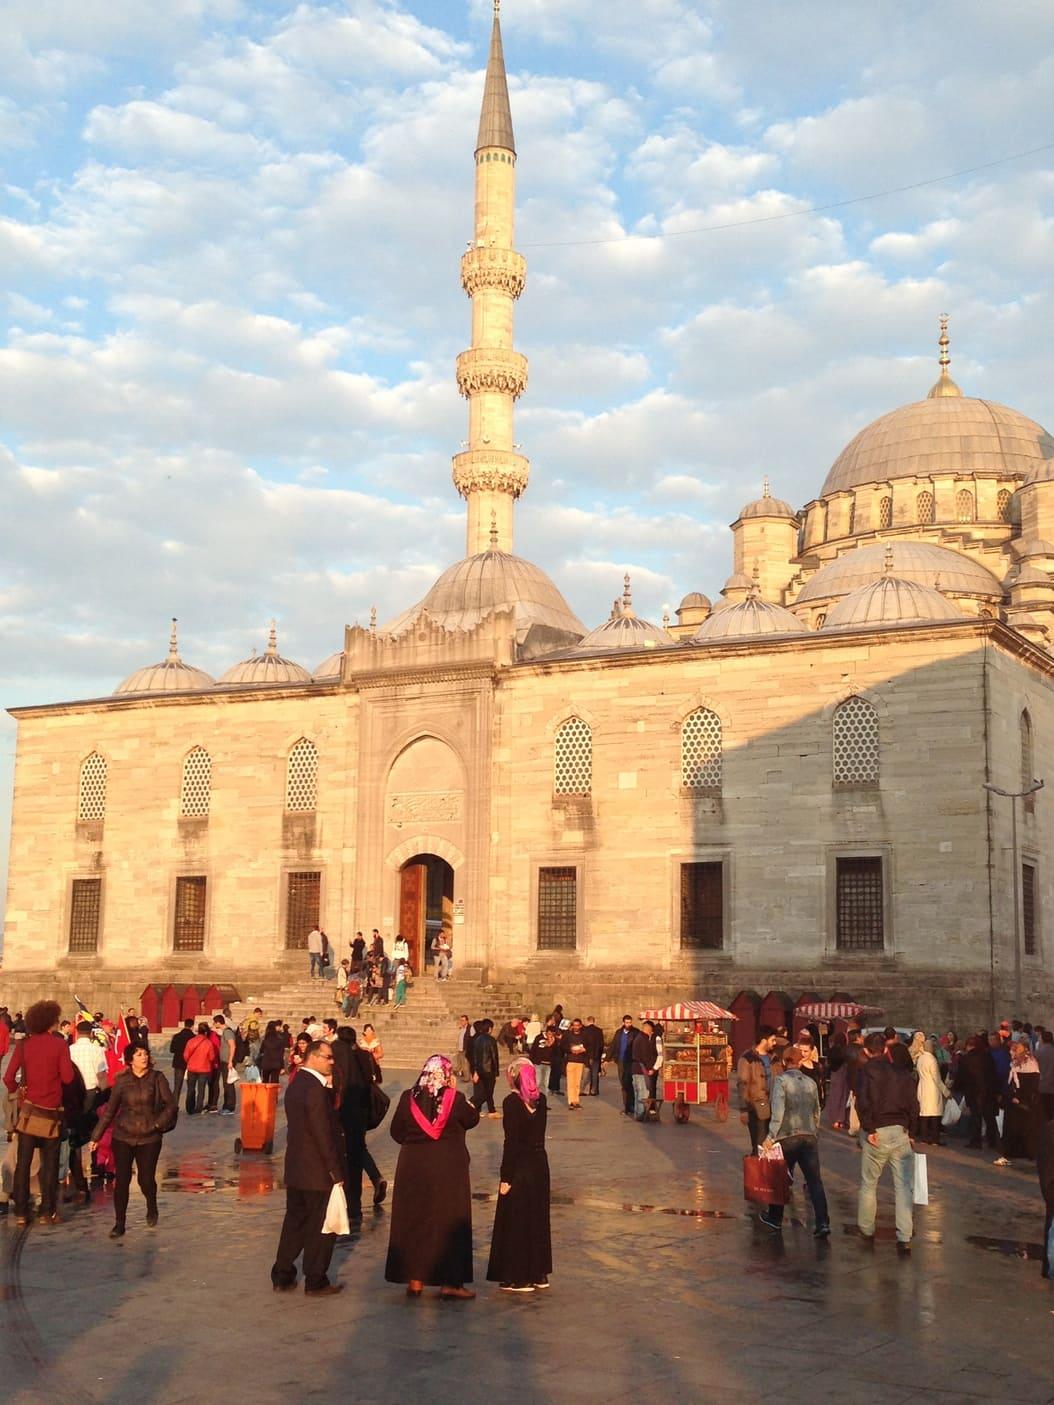 Mosquees - istanbul - turquie 2